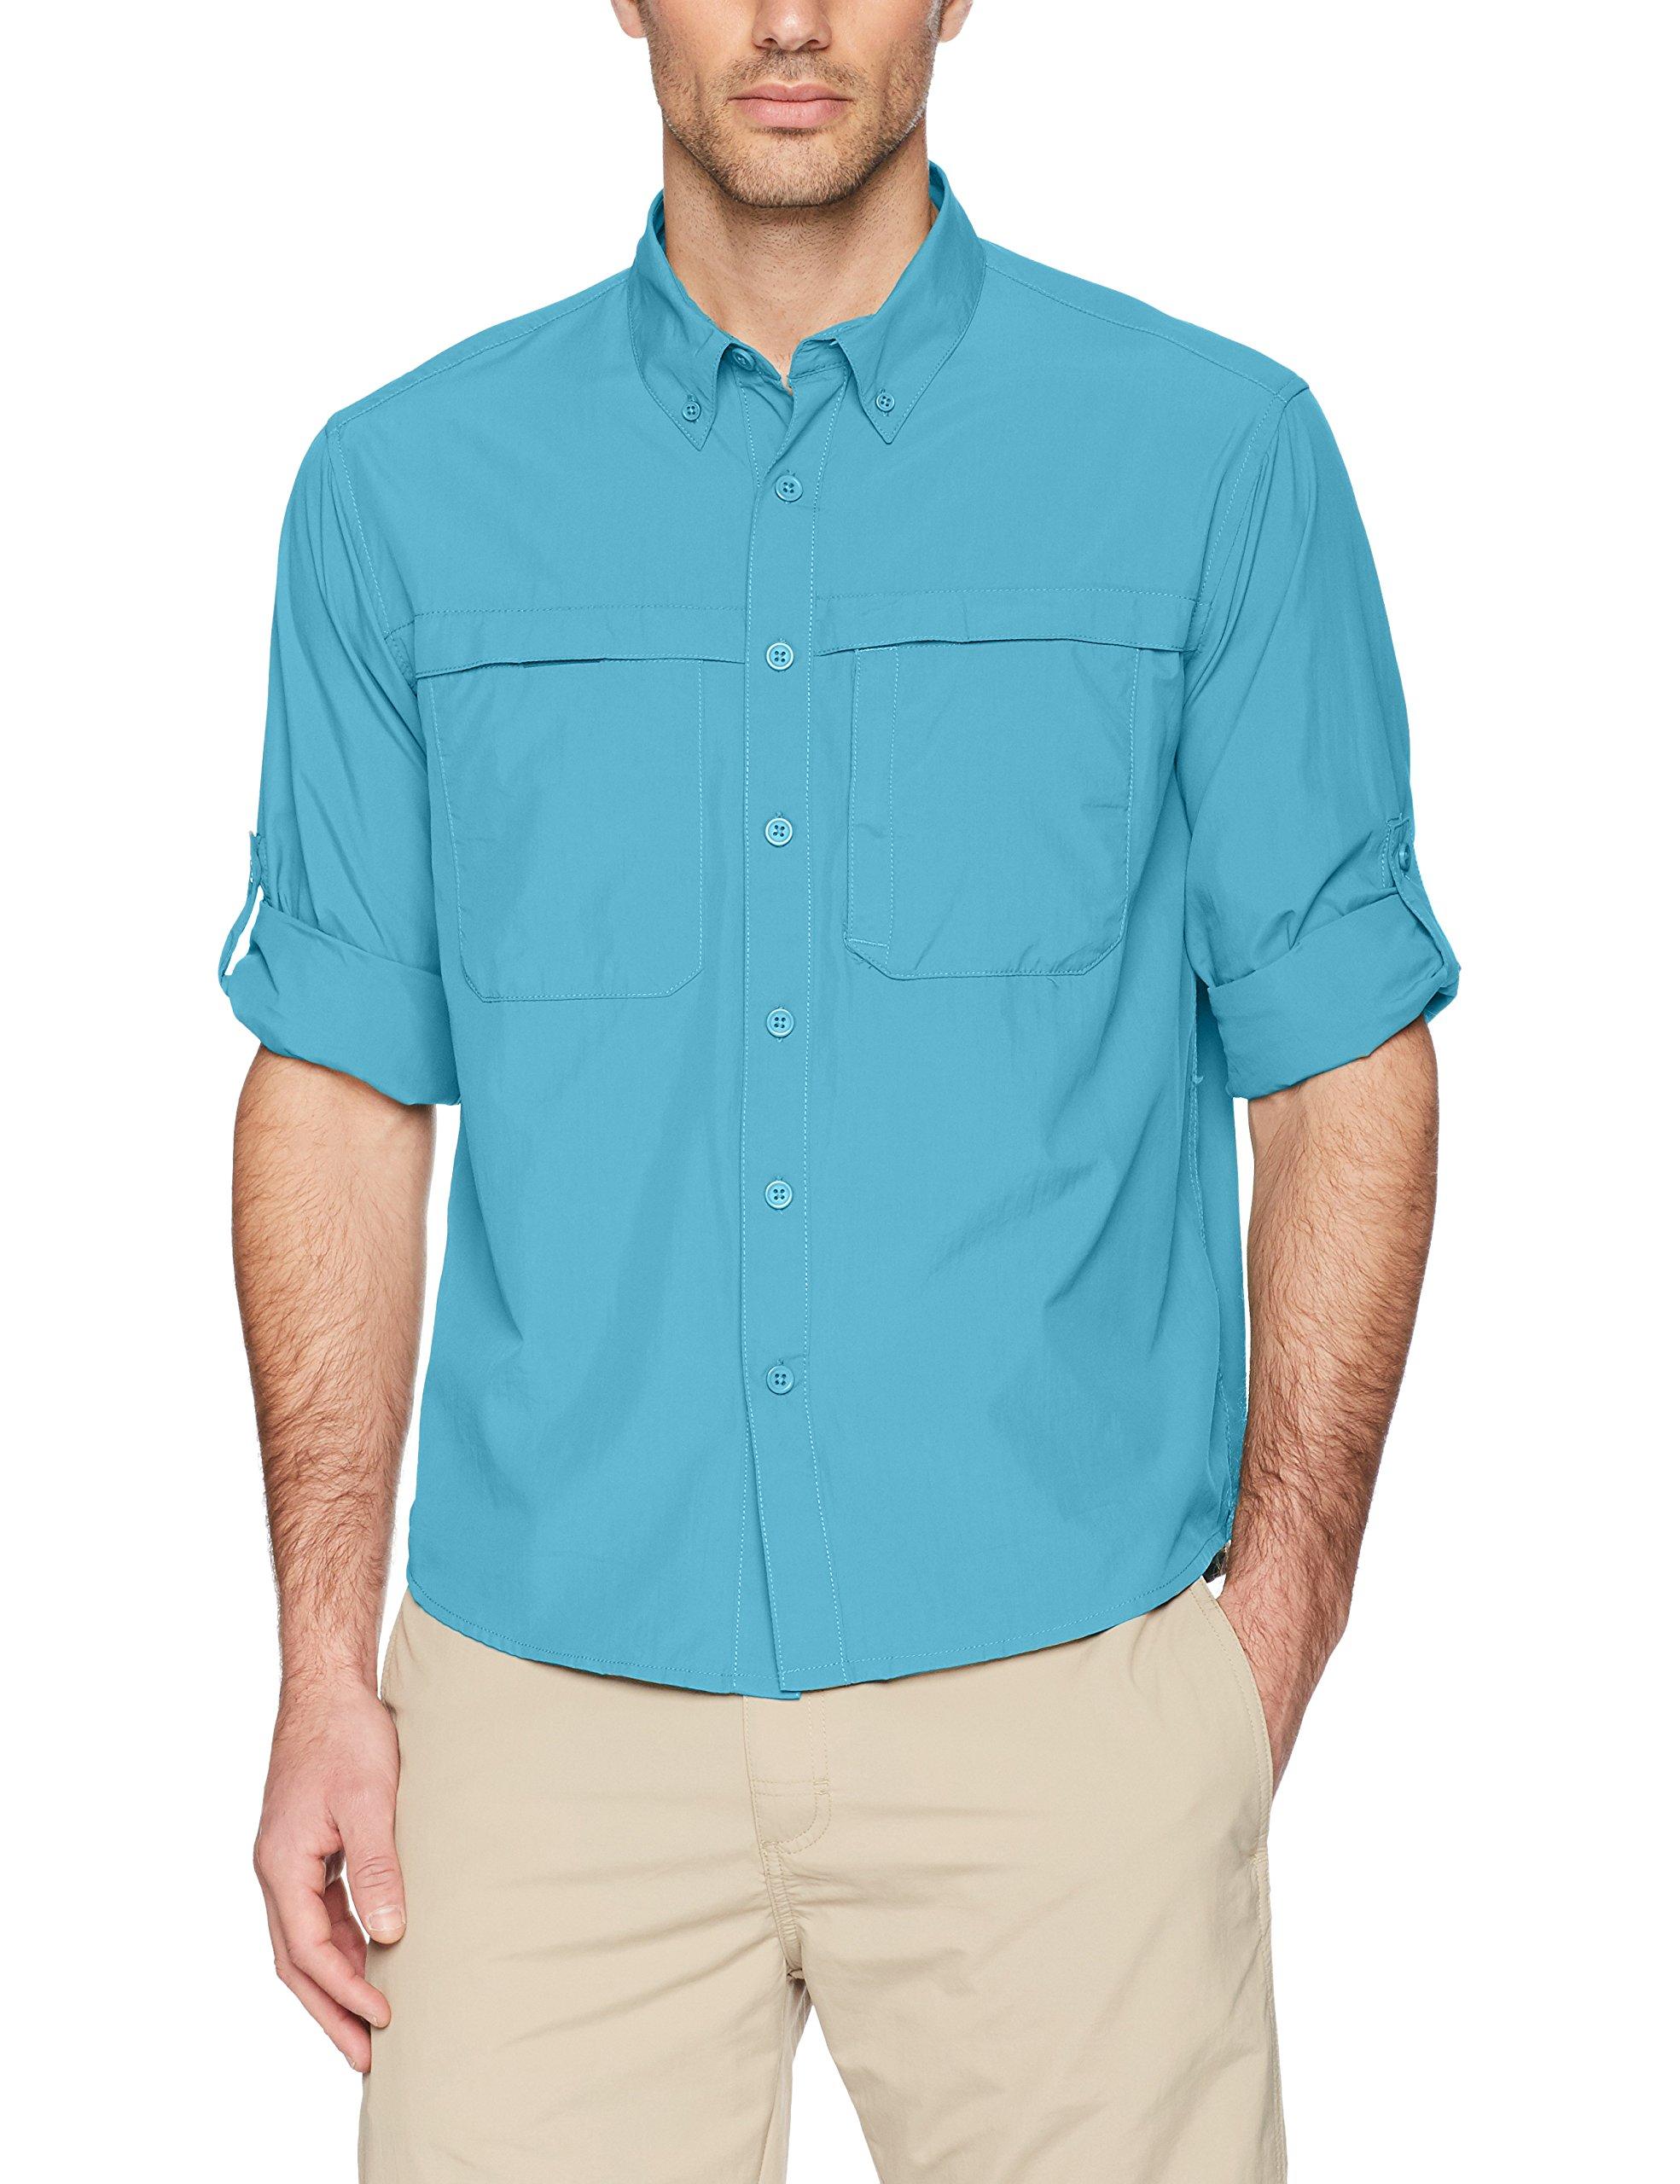 White Sierra Kalgoorlie Cool Touch Long Sleeve Shirt, Niagara Blue, X-Large